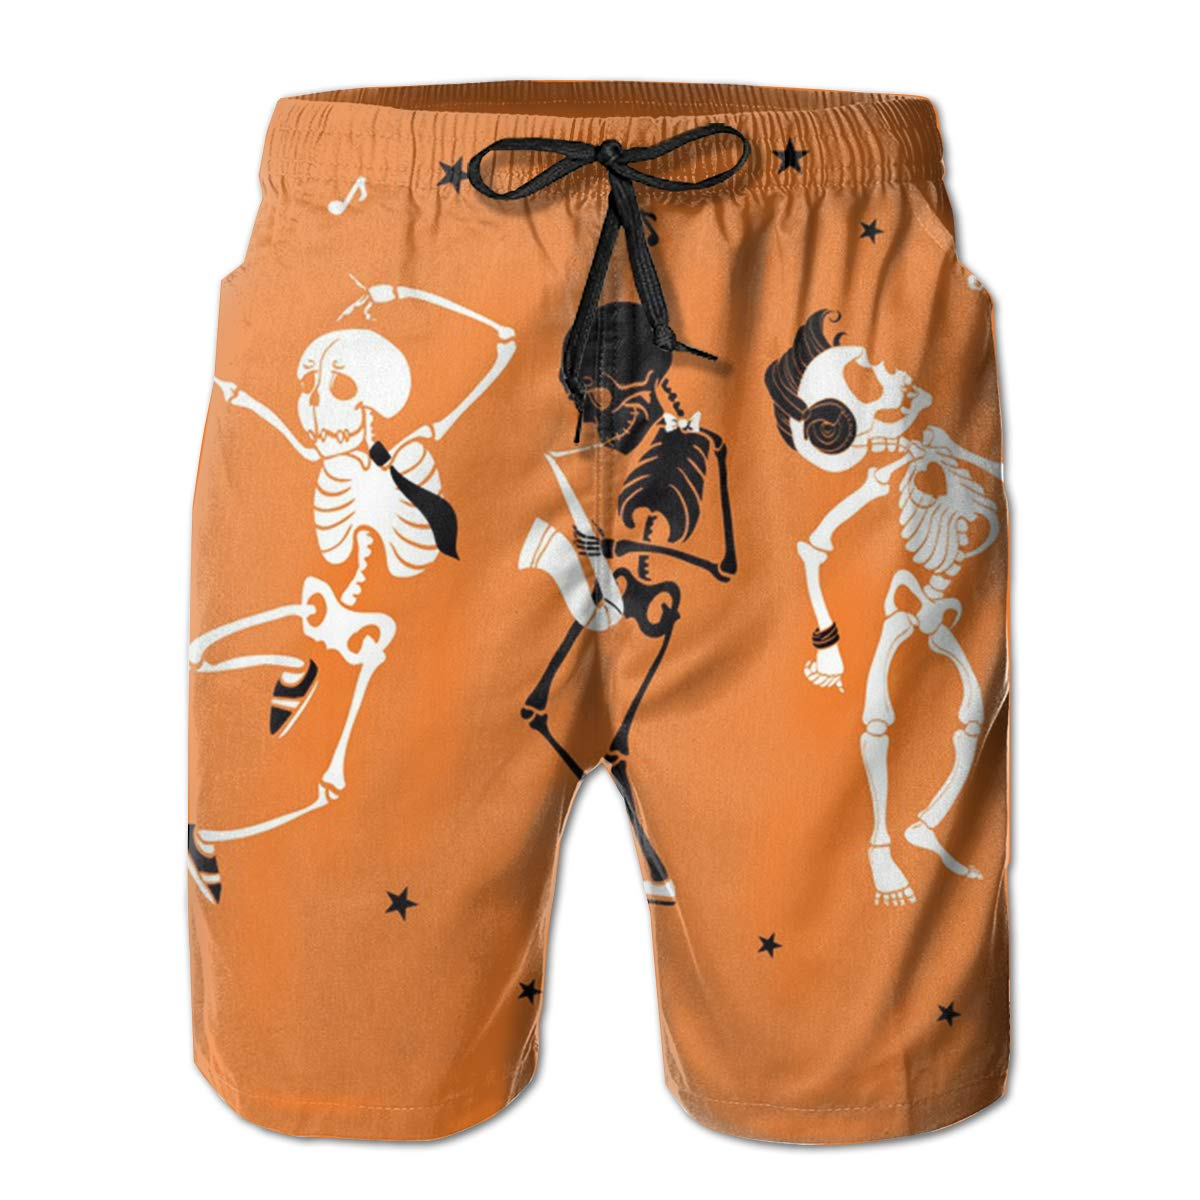 Swim Trunks Board Shorts for Men Fancy Illusion Skull Skeleton Cute Boys Mens Shorts